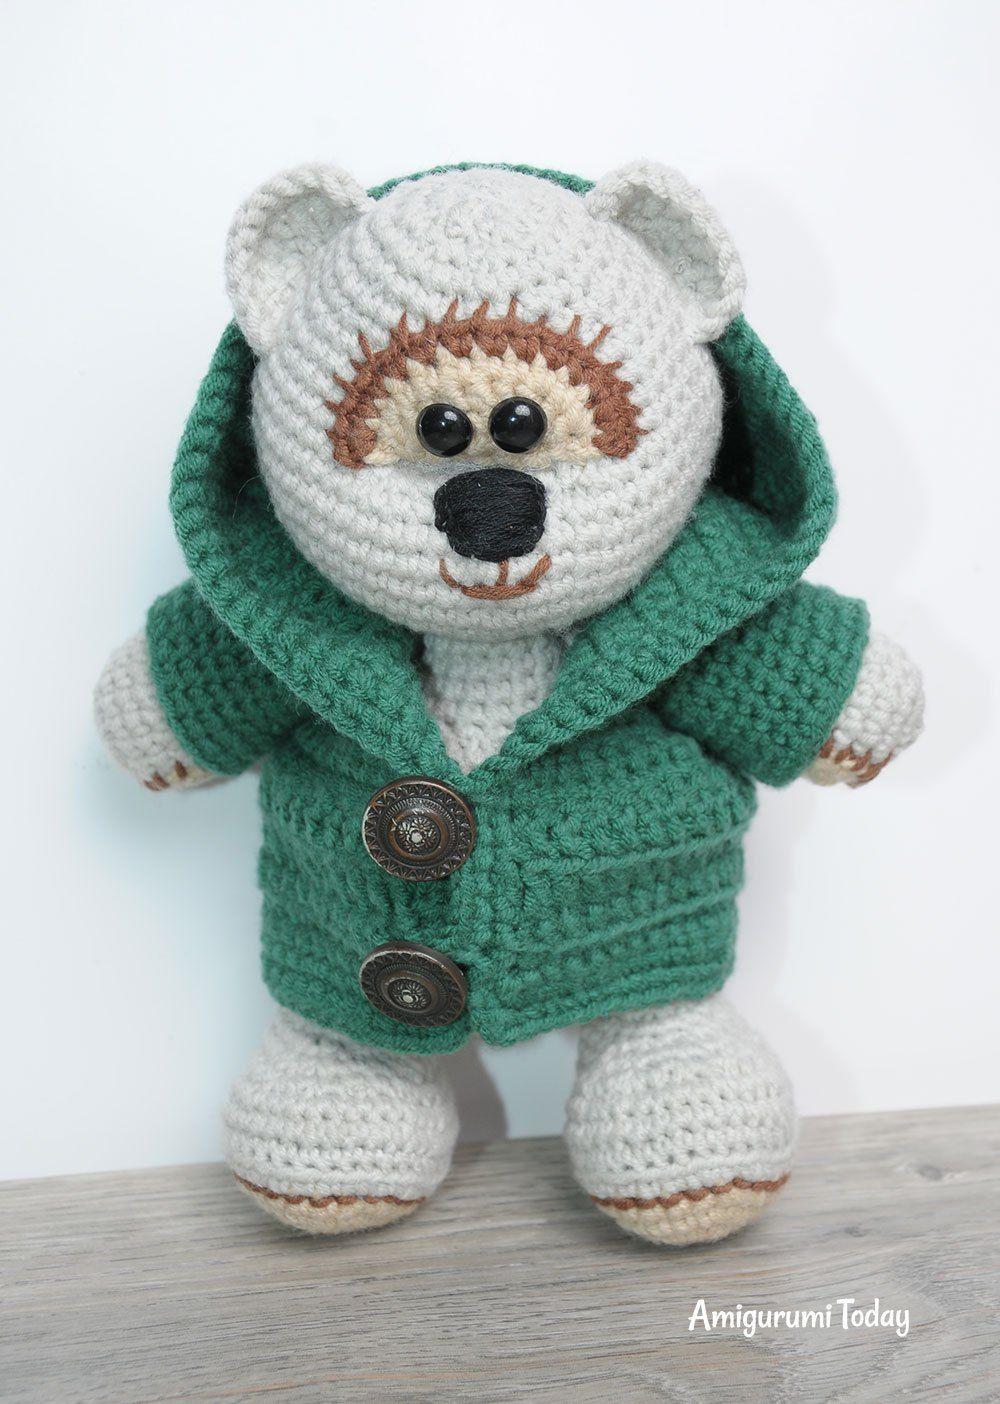 Schön Häkeln Teddy Muster Ideen - Strickmuster-Ideen ...